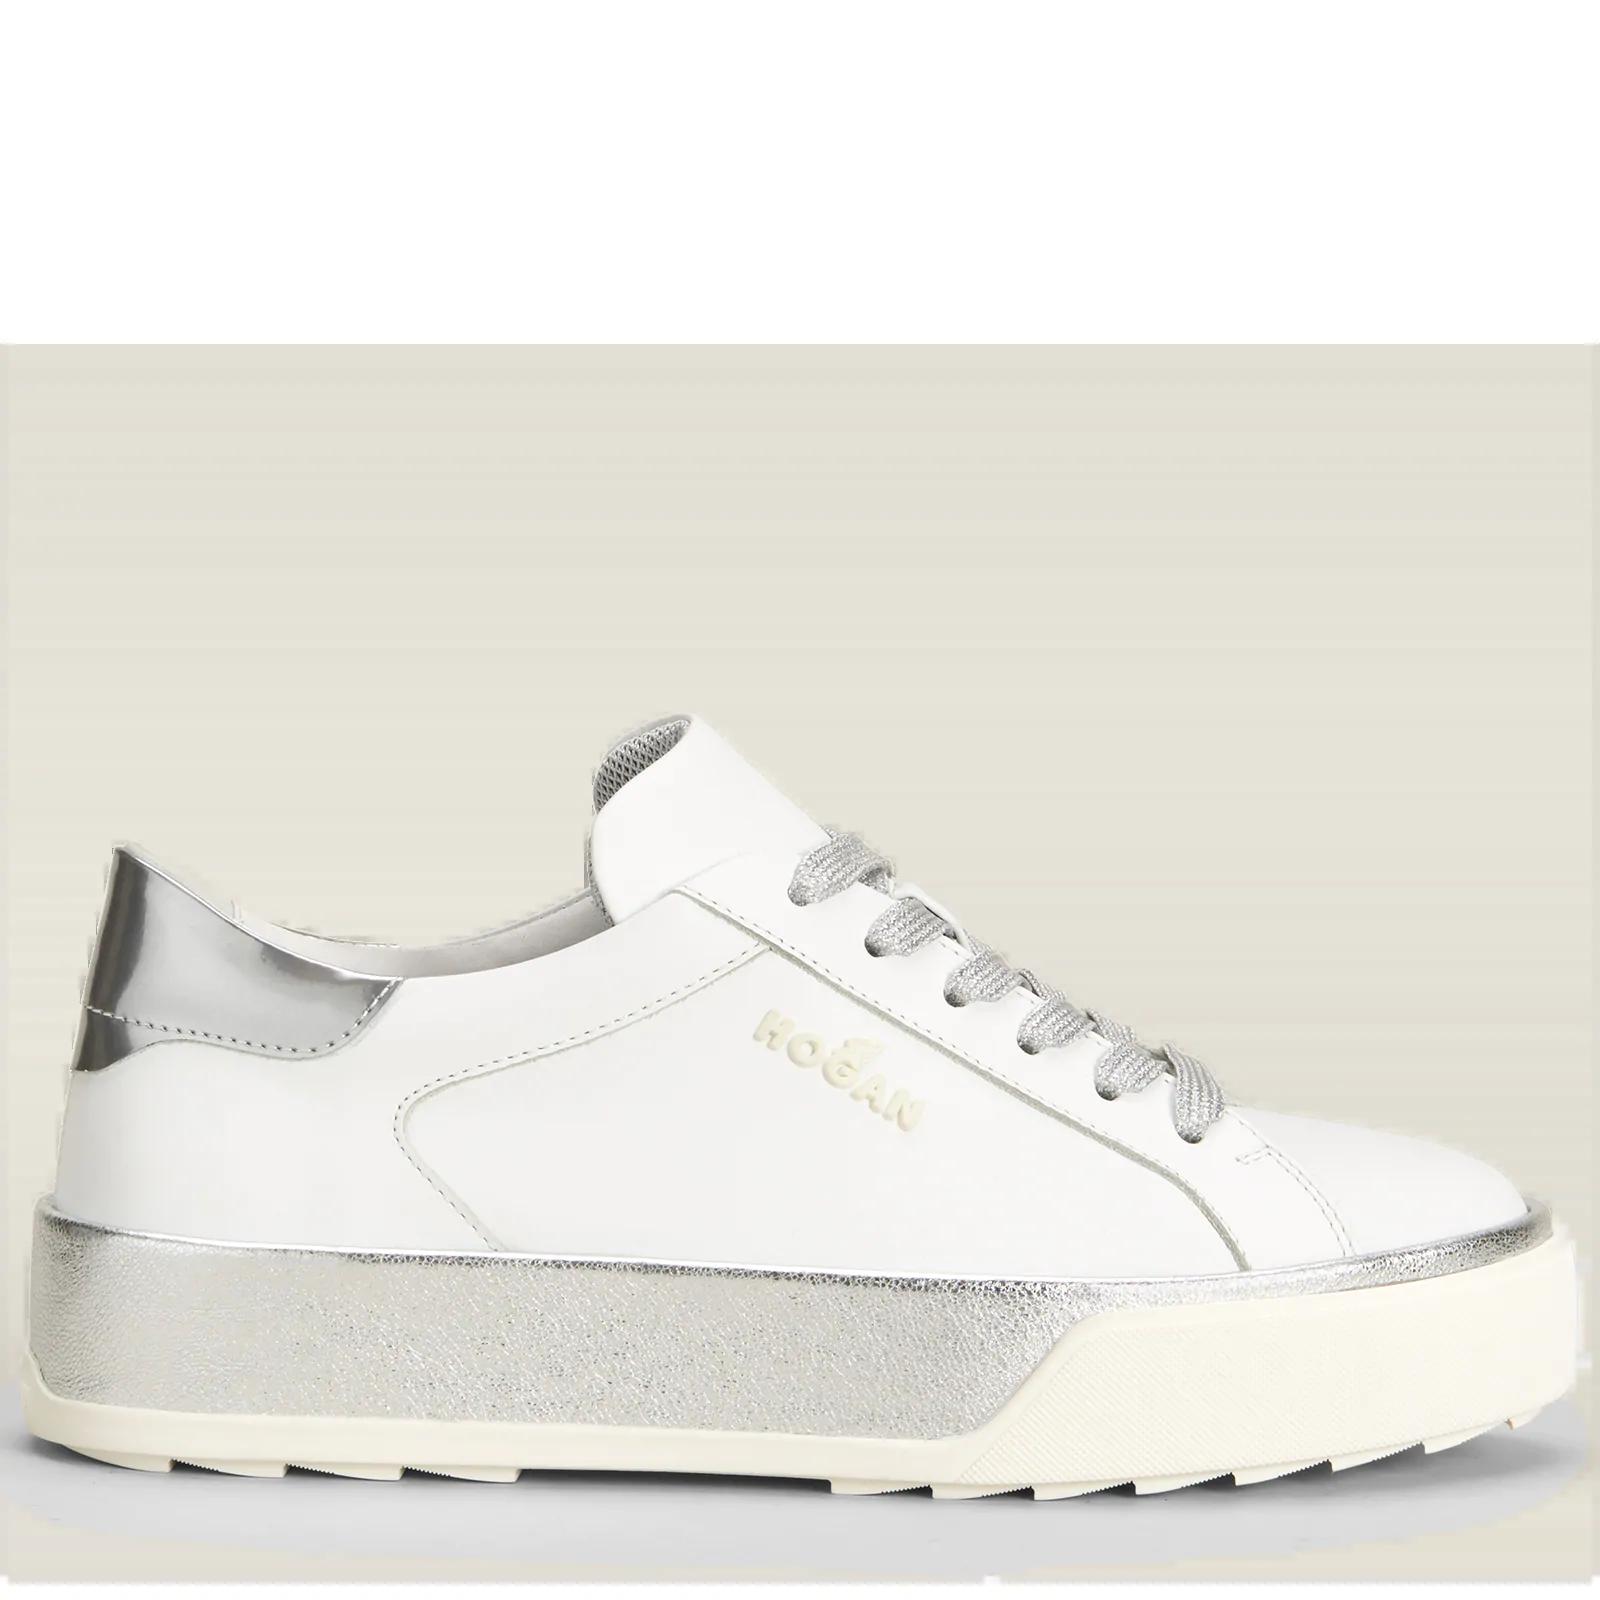 Hogan - Sneakers - H320 In Silber,weiss   ModeSens